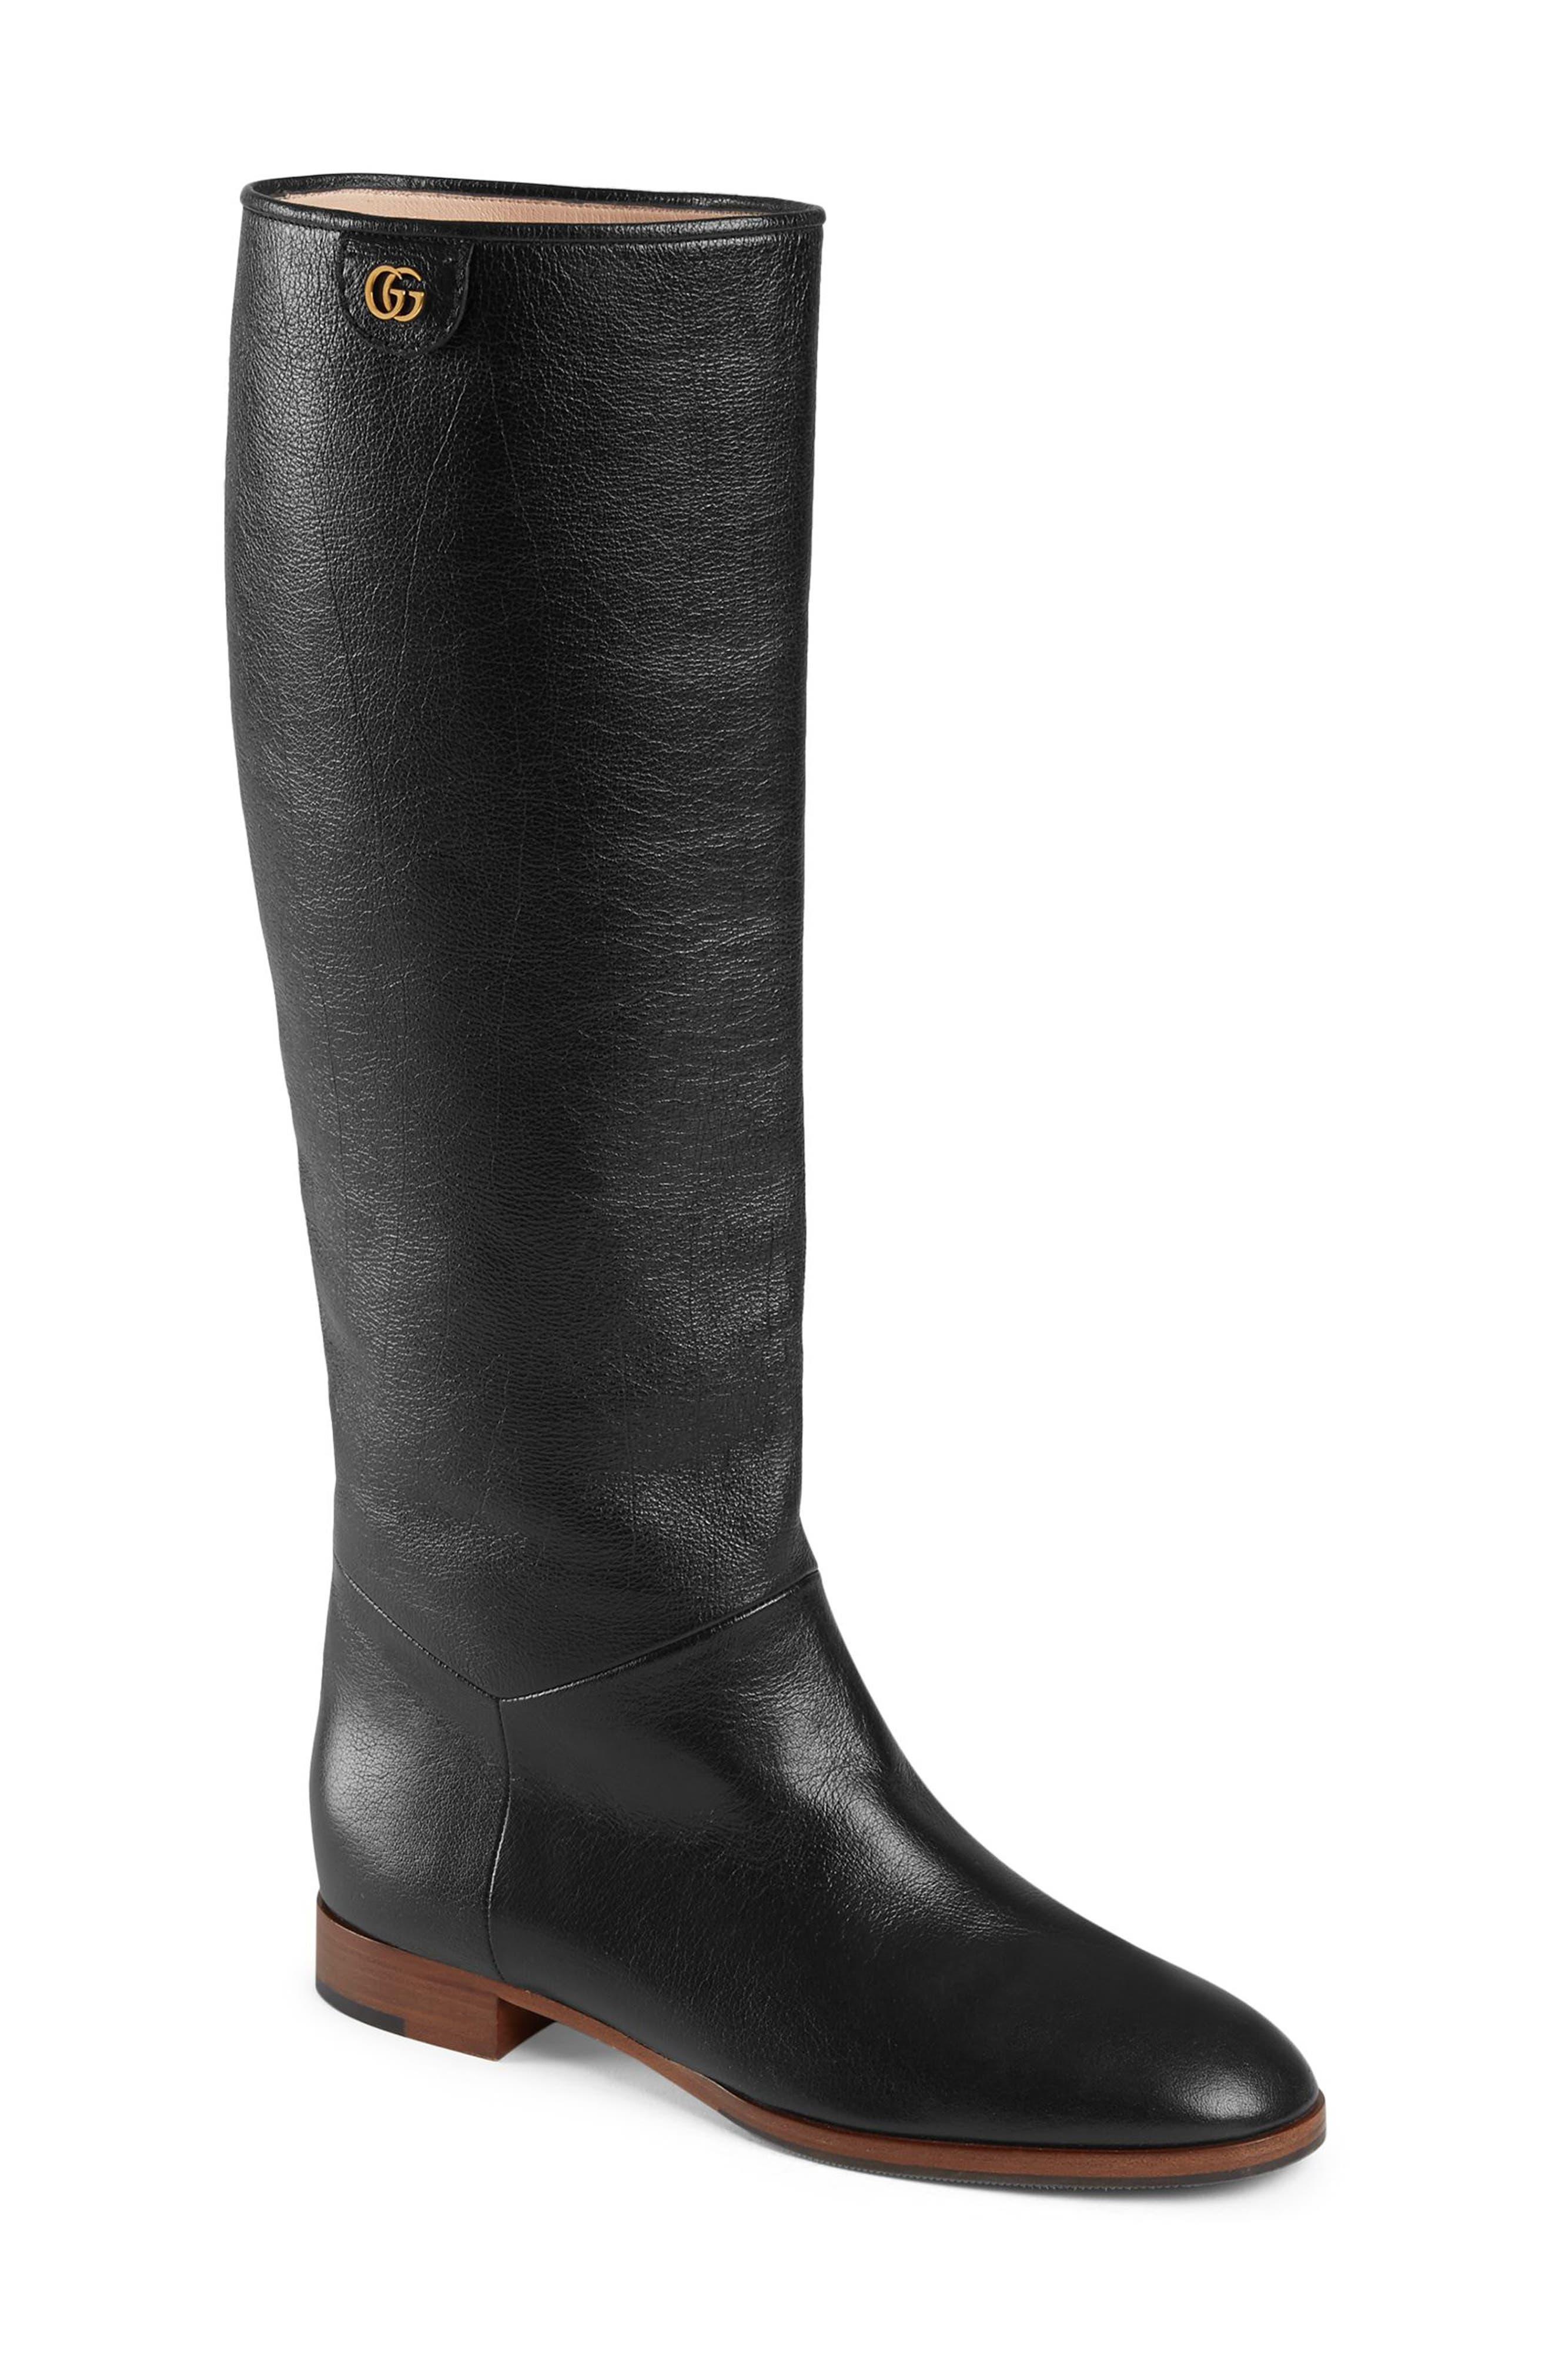 Rebelle Boot,                         Main,                         color, BLACK